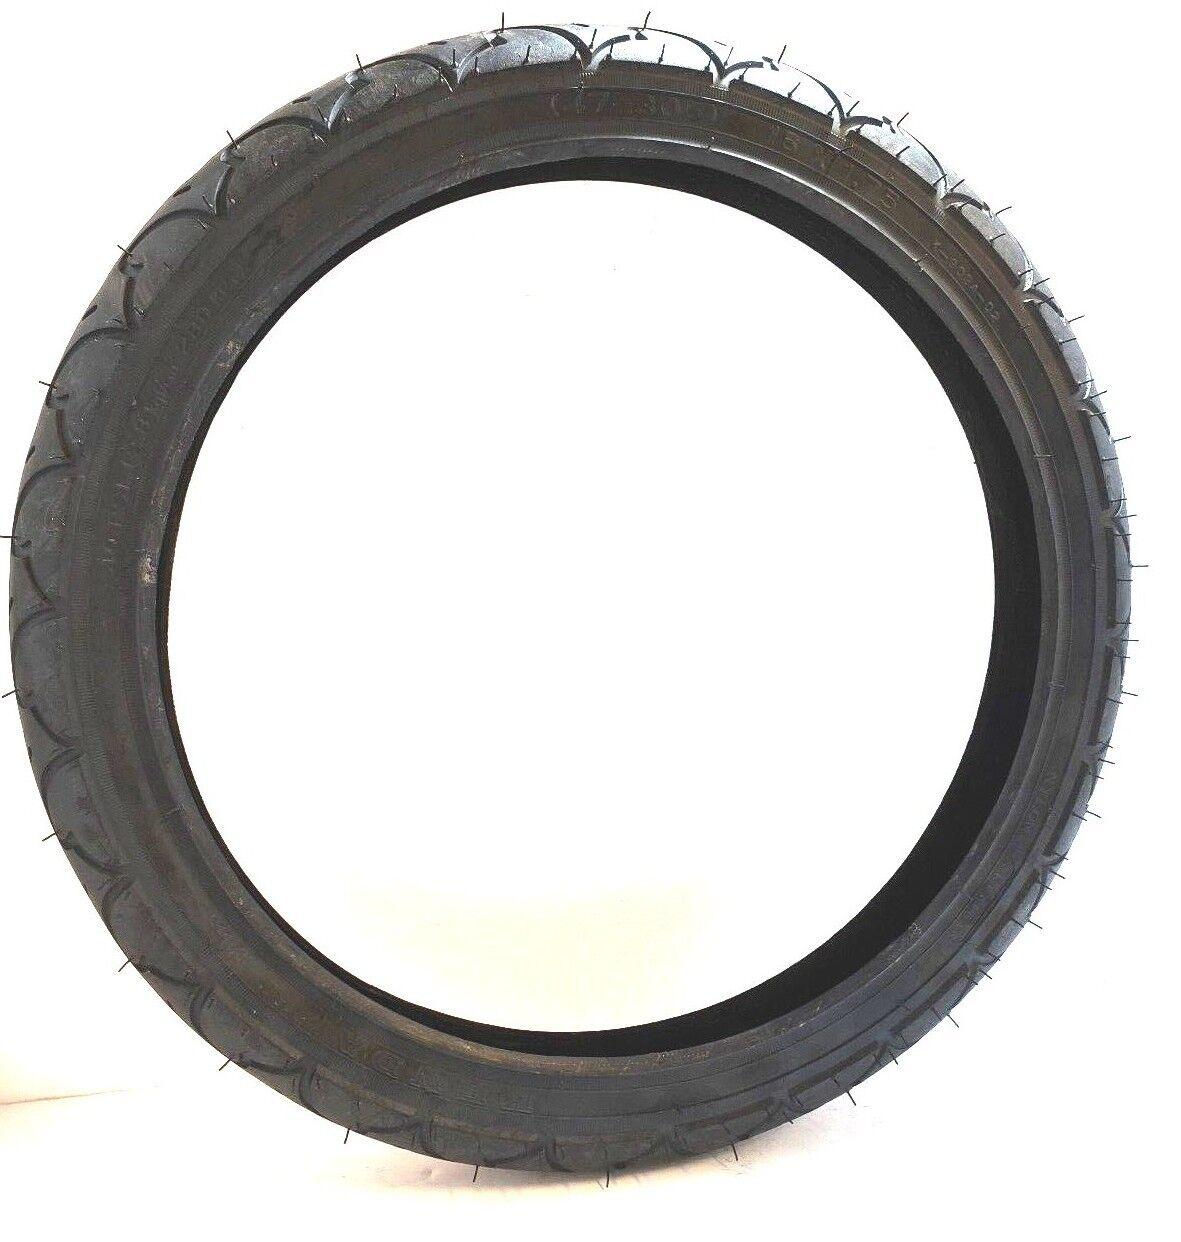 "Recumbent Trailer 40-65psi Bicycle Kenda K909A 20/"" x 1.75/"" Tire Freestyle BMX"